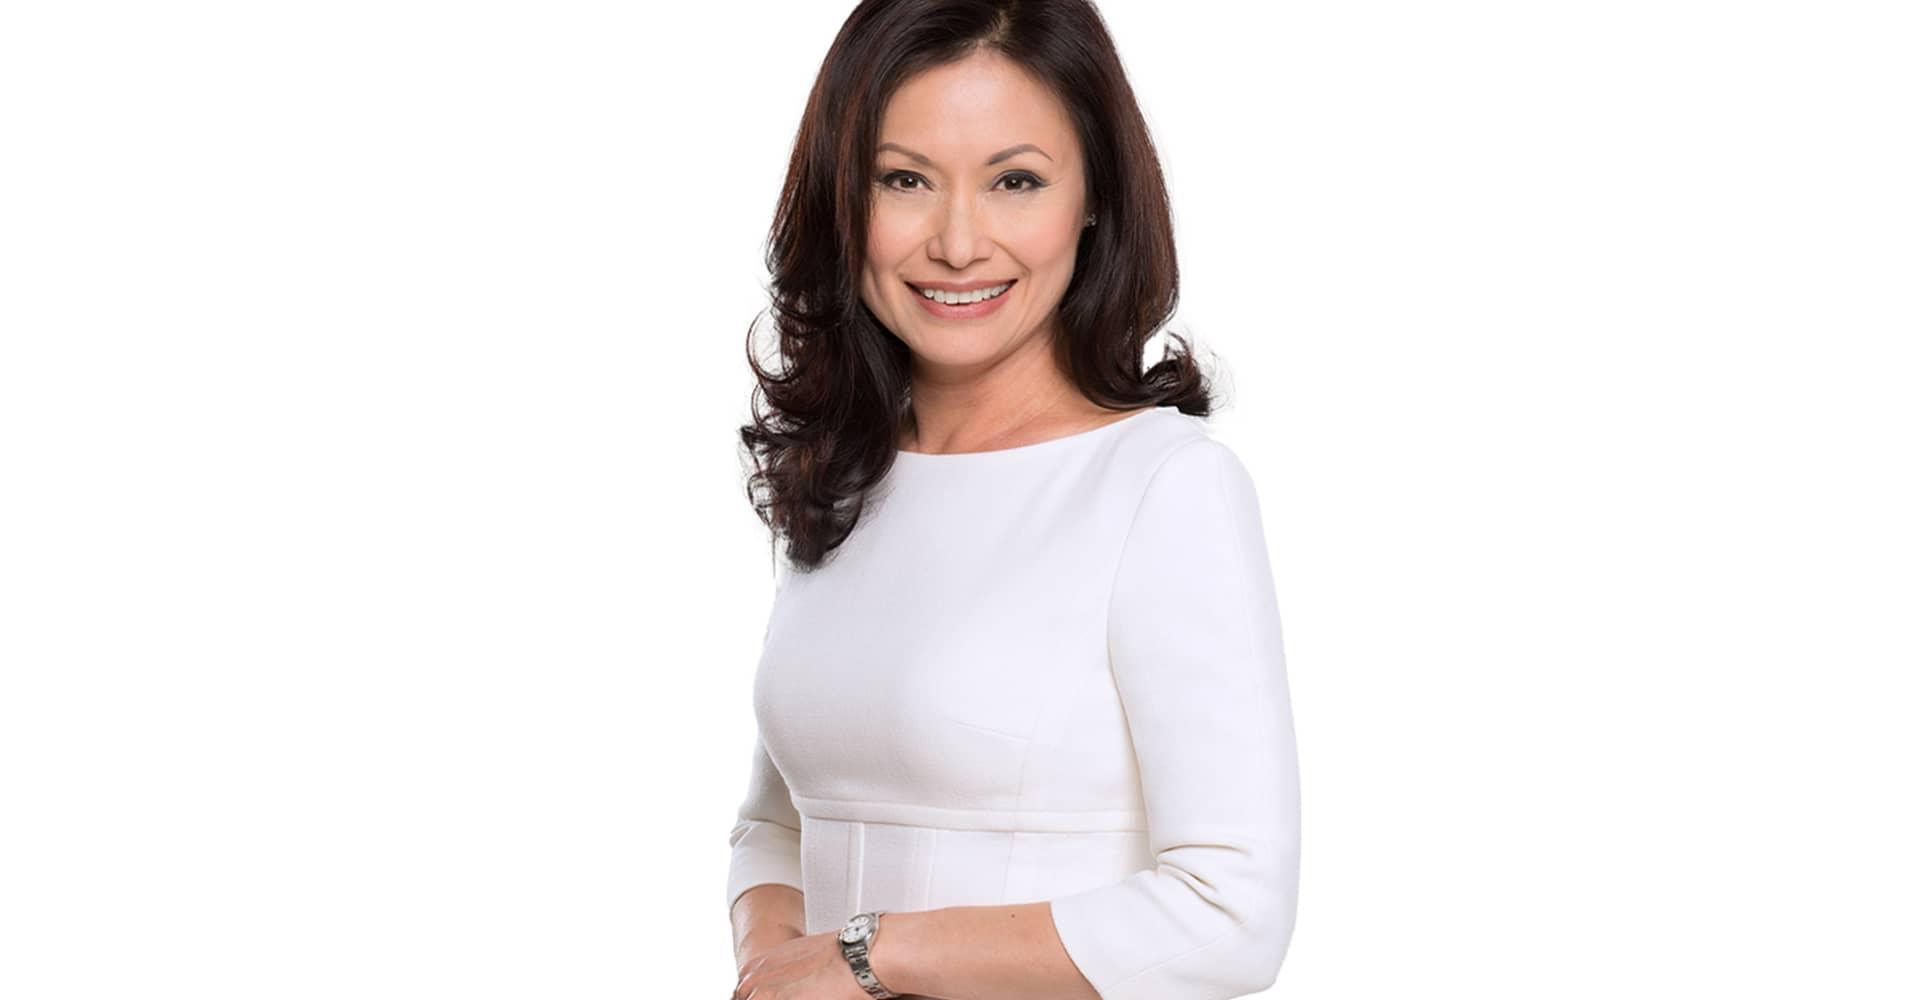 Christine Tan Profile Cnbc